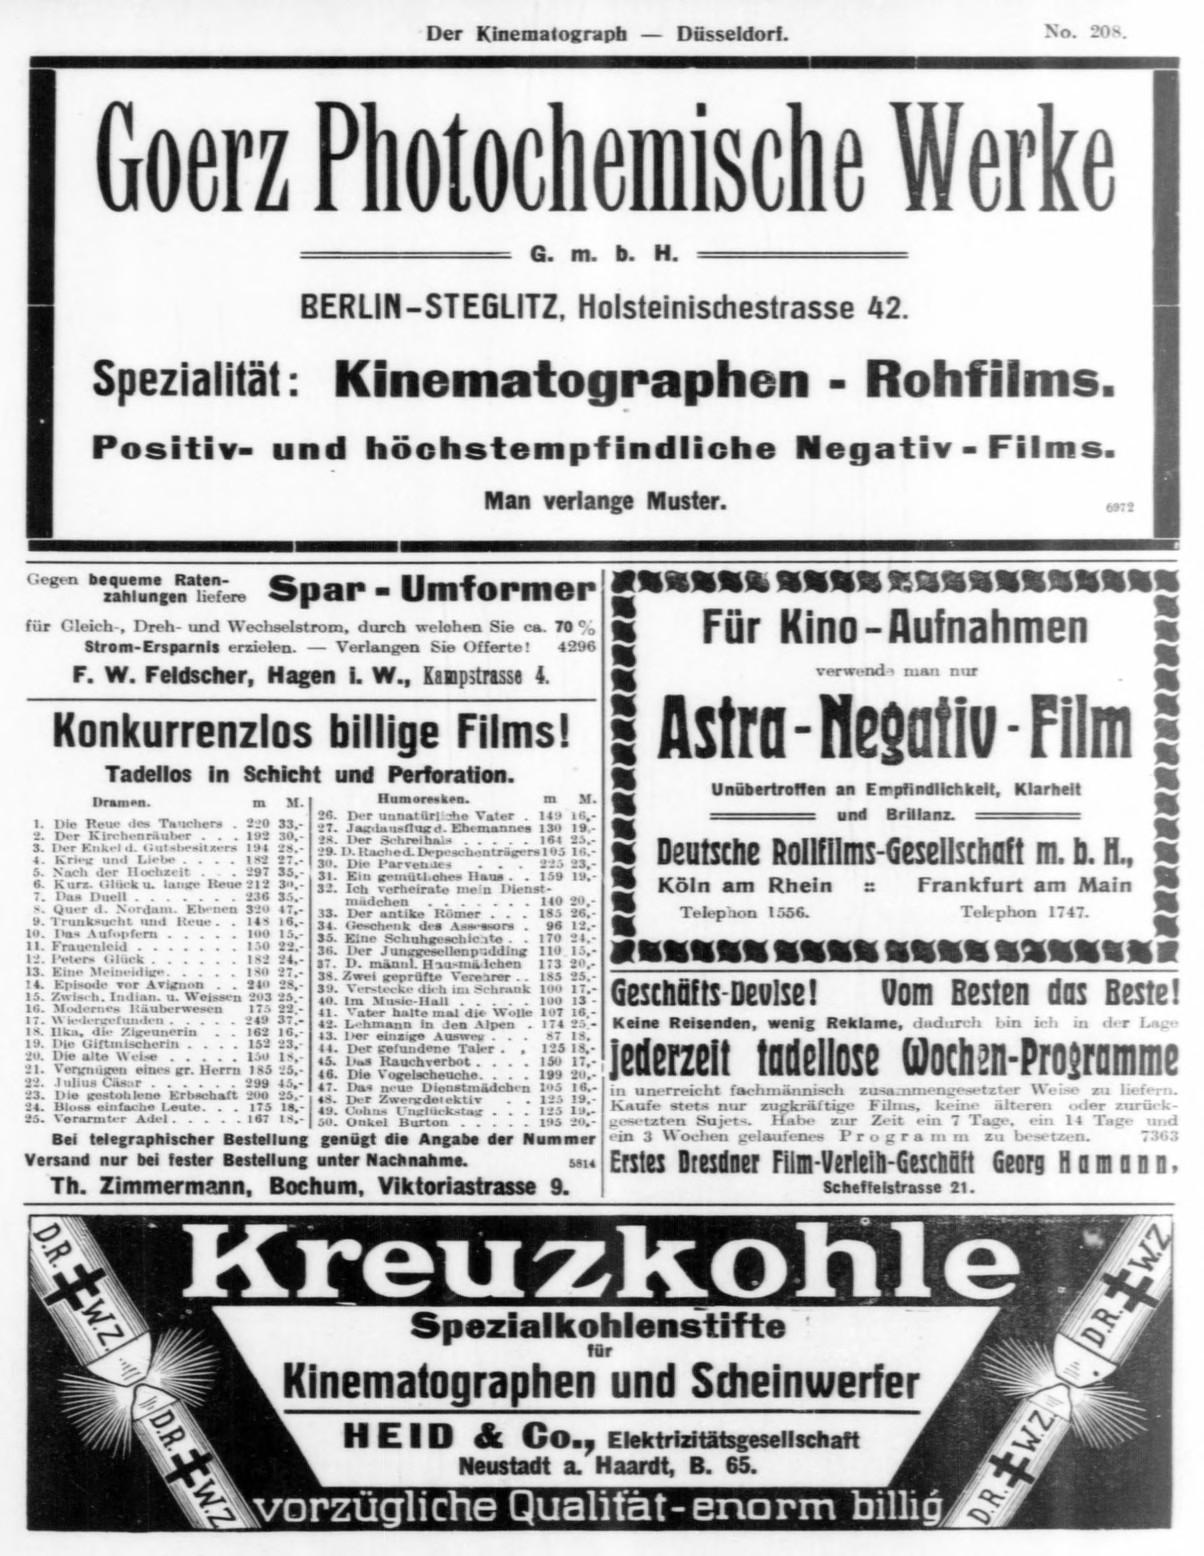 Kinematograph04-1910-12_jp2.zip&file=kinematograph04-1910-12_jp2%2fkinematograph04-1910-12_0074